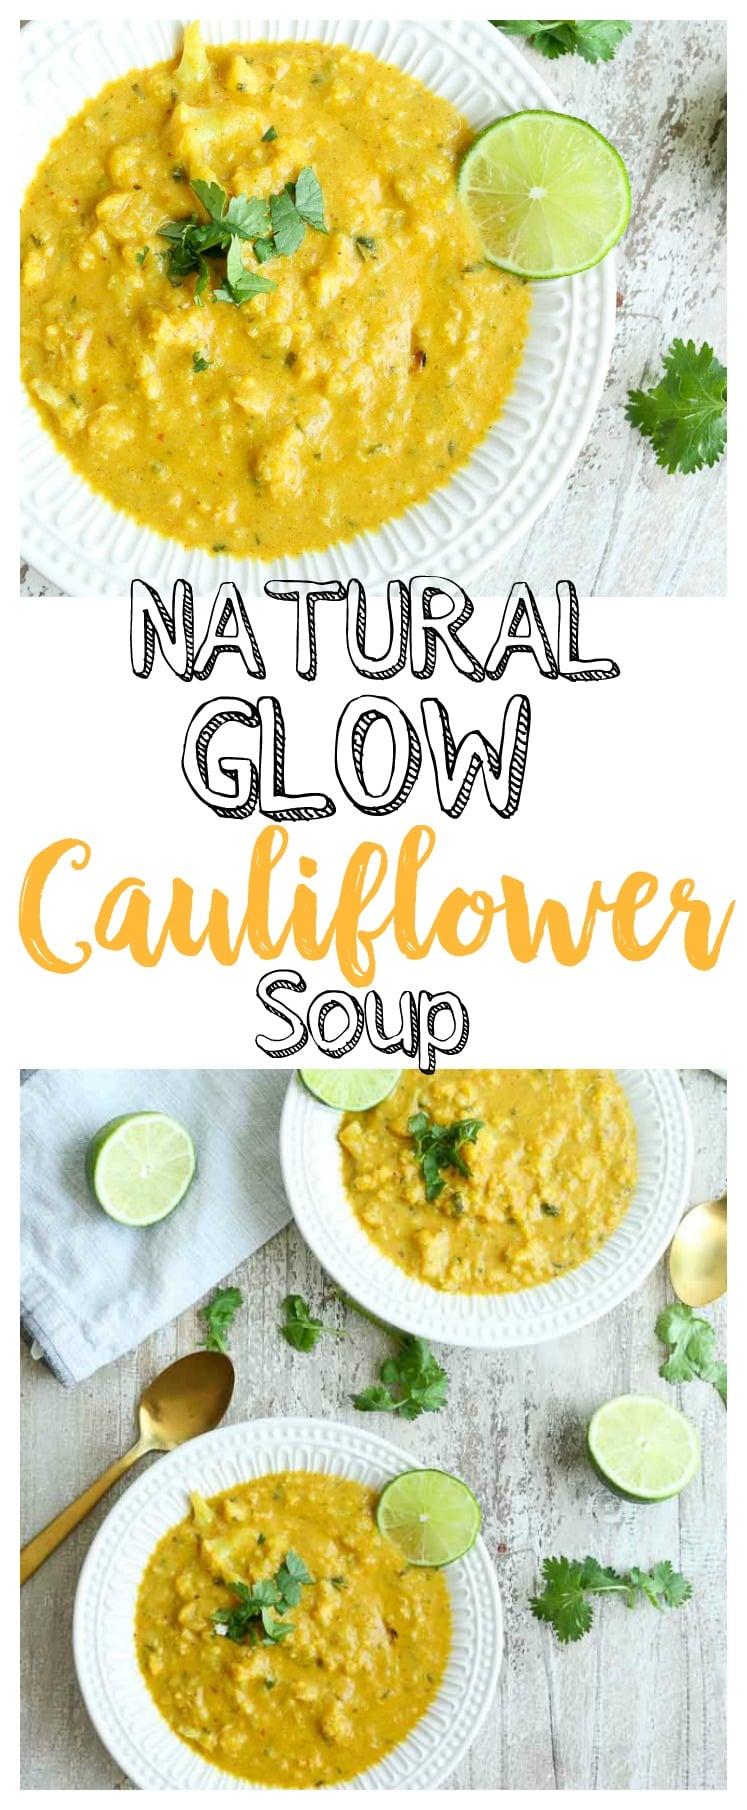 Cauliflower soup | gluten-free | vegan friendly | Paleo | healthy recipe